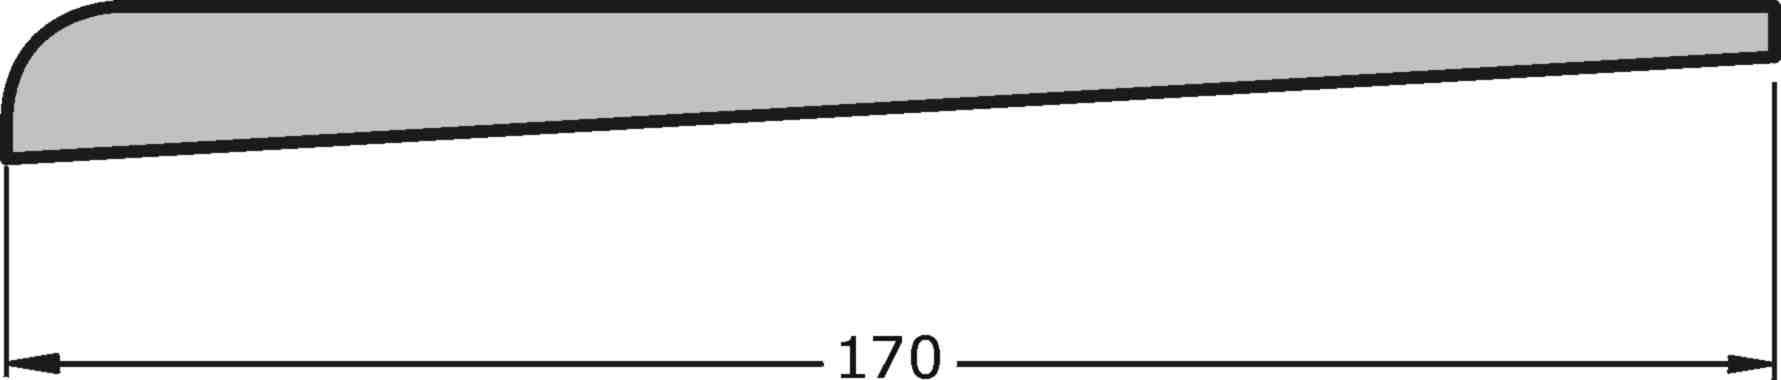 Luvia Round Edge Weatherboards 175x16mm Size